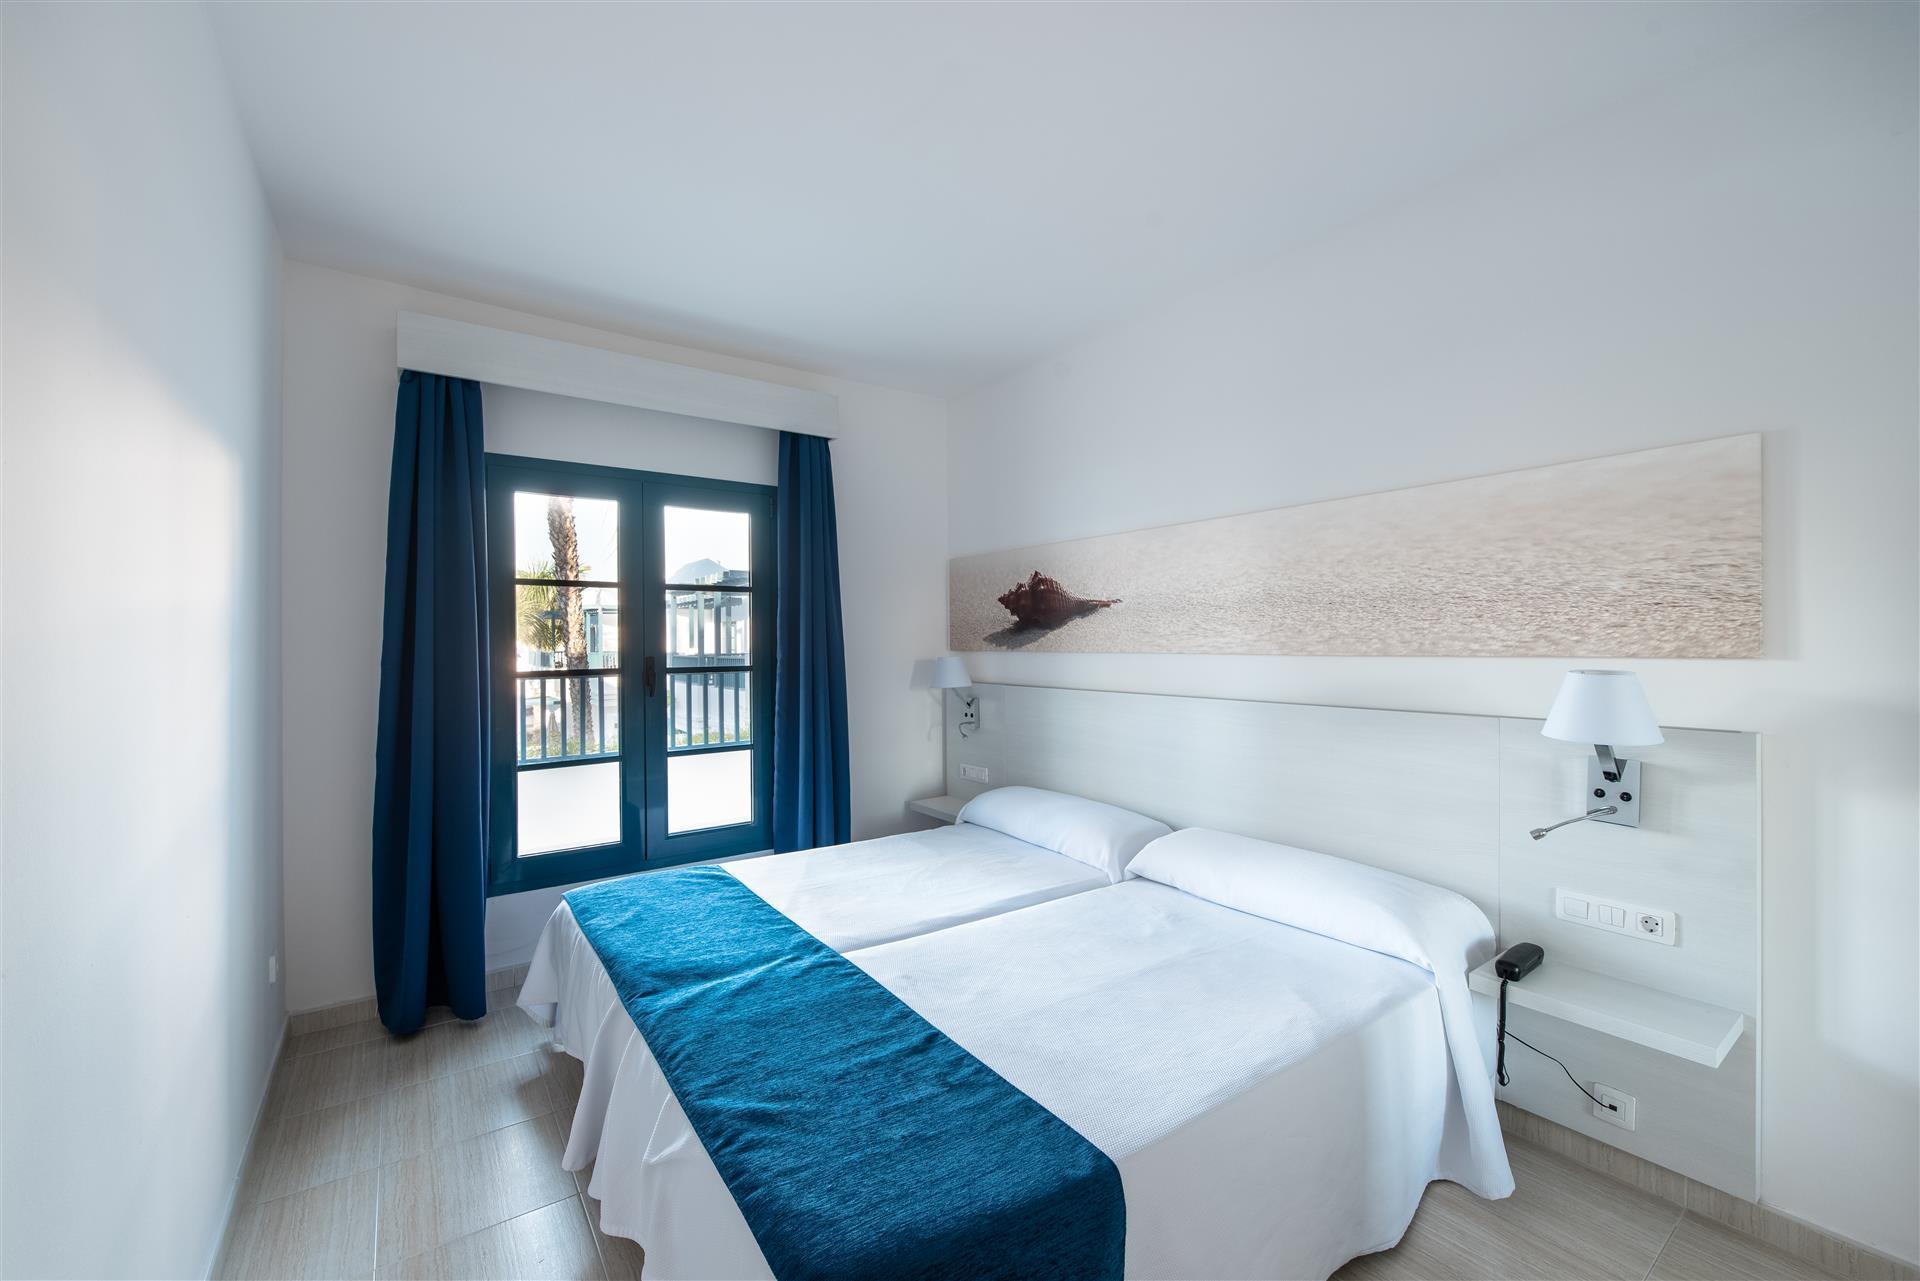 thb-tropical-island-hotel 3924